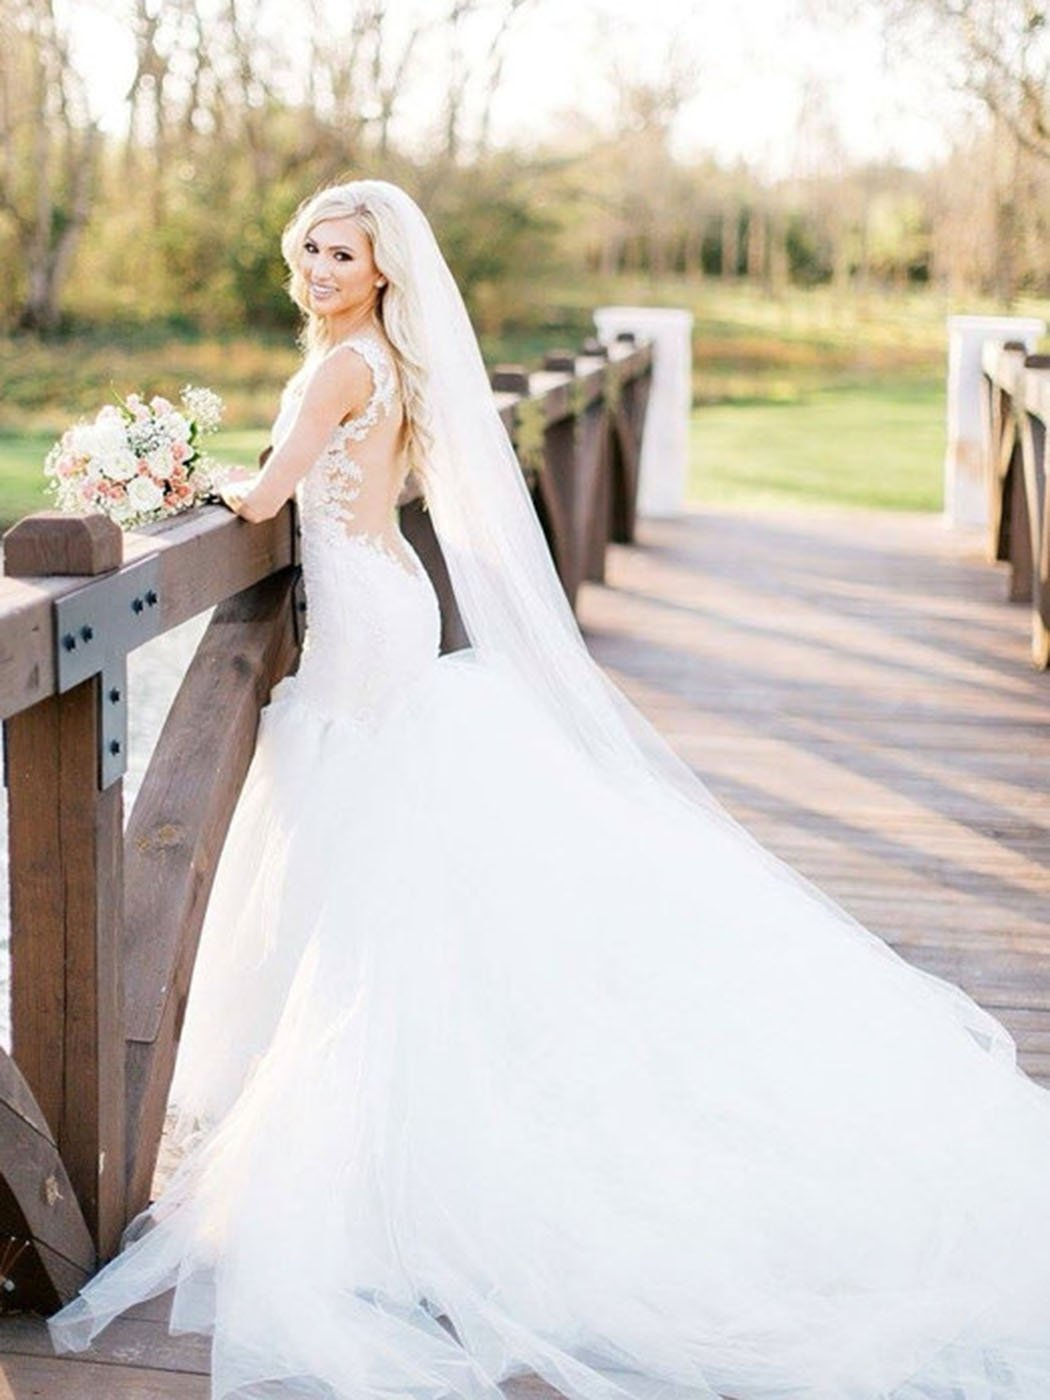 Amazon Com Barogirl Wedding Veil Comb Bridal Cathedral Veil 1 Tier Drop Veil Wedding Rhinestones Hair Comb For Brides 118 Inches White Beauty